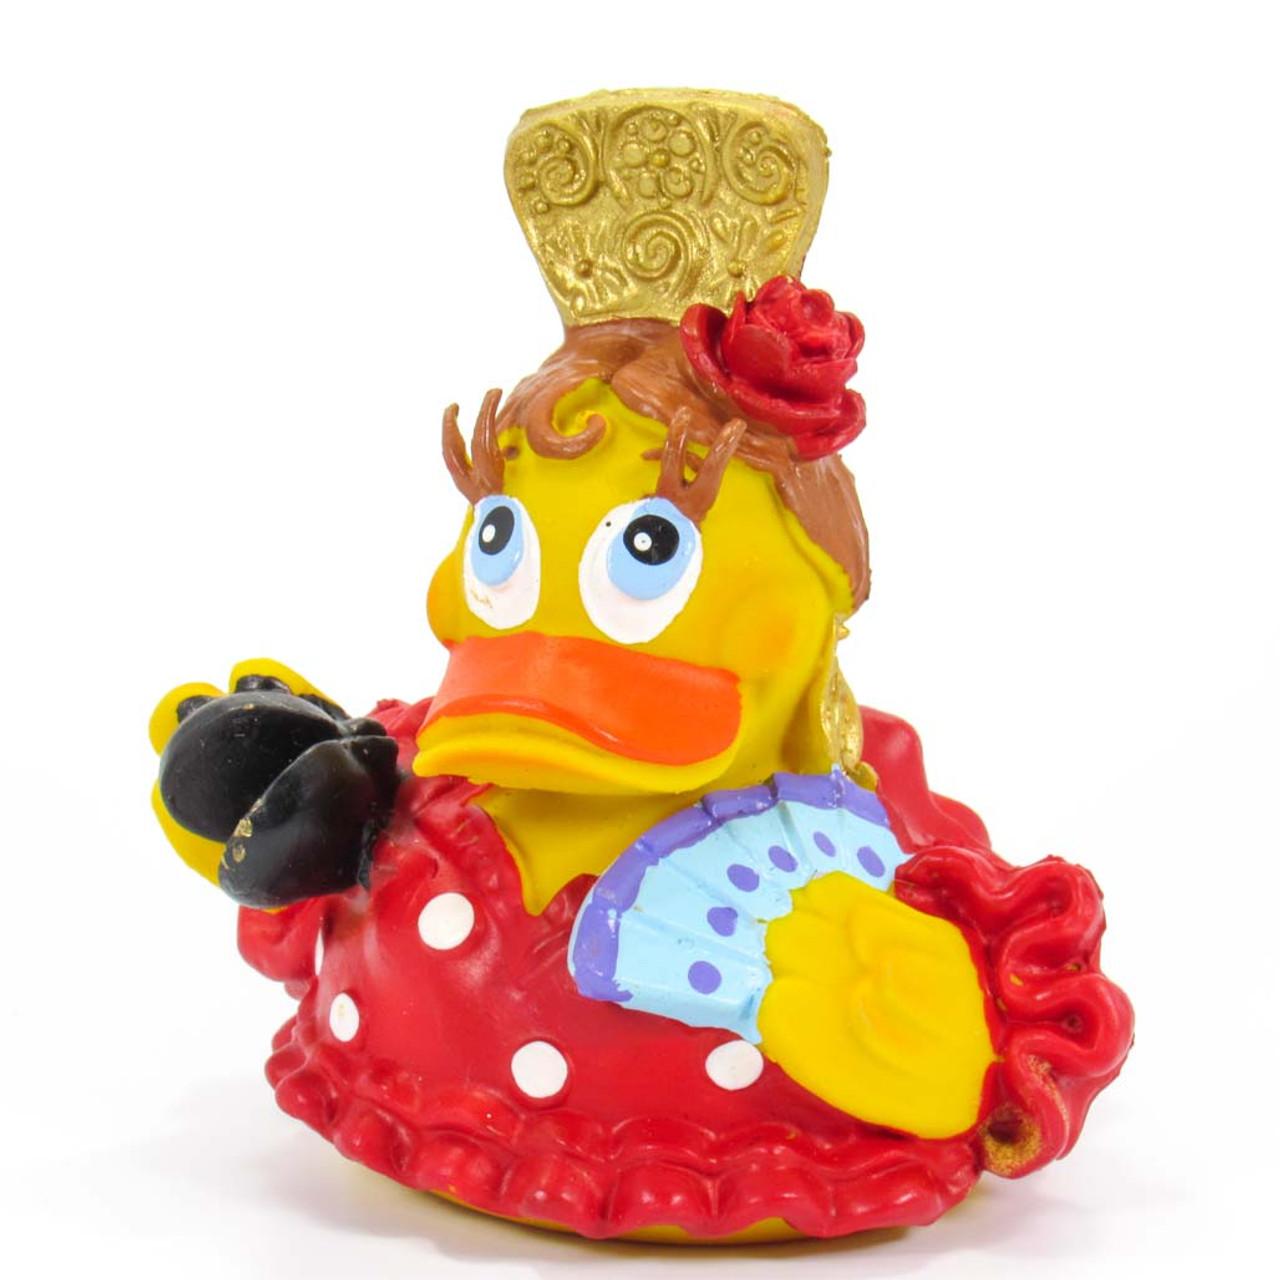 Ballerina Rubber Duck